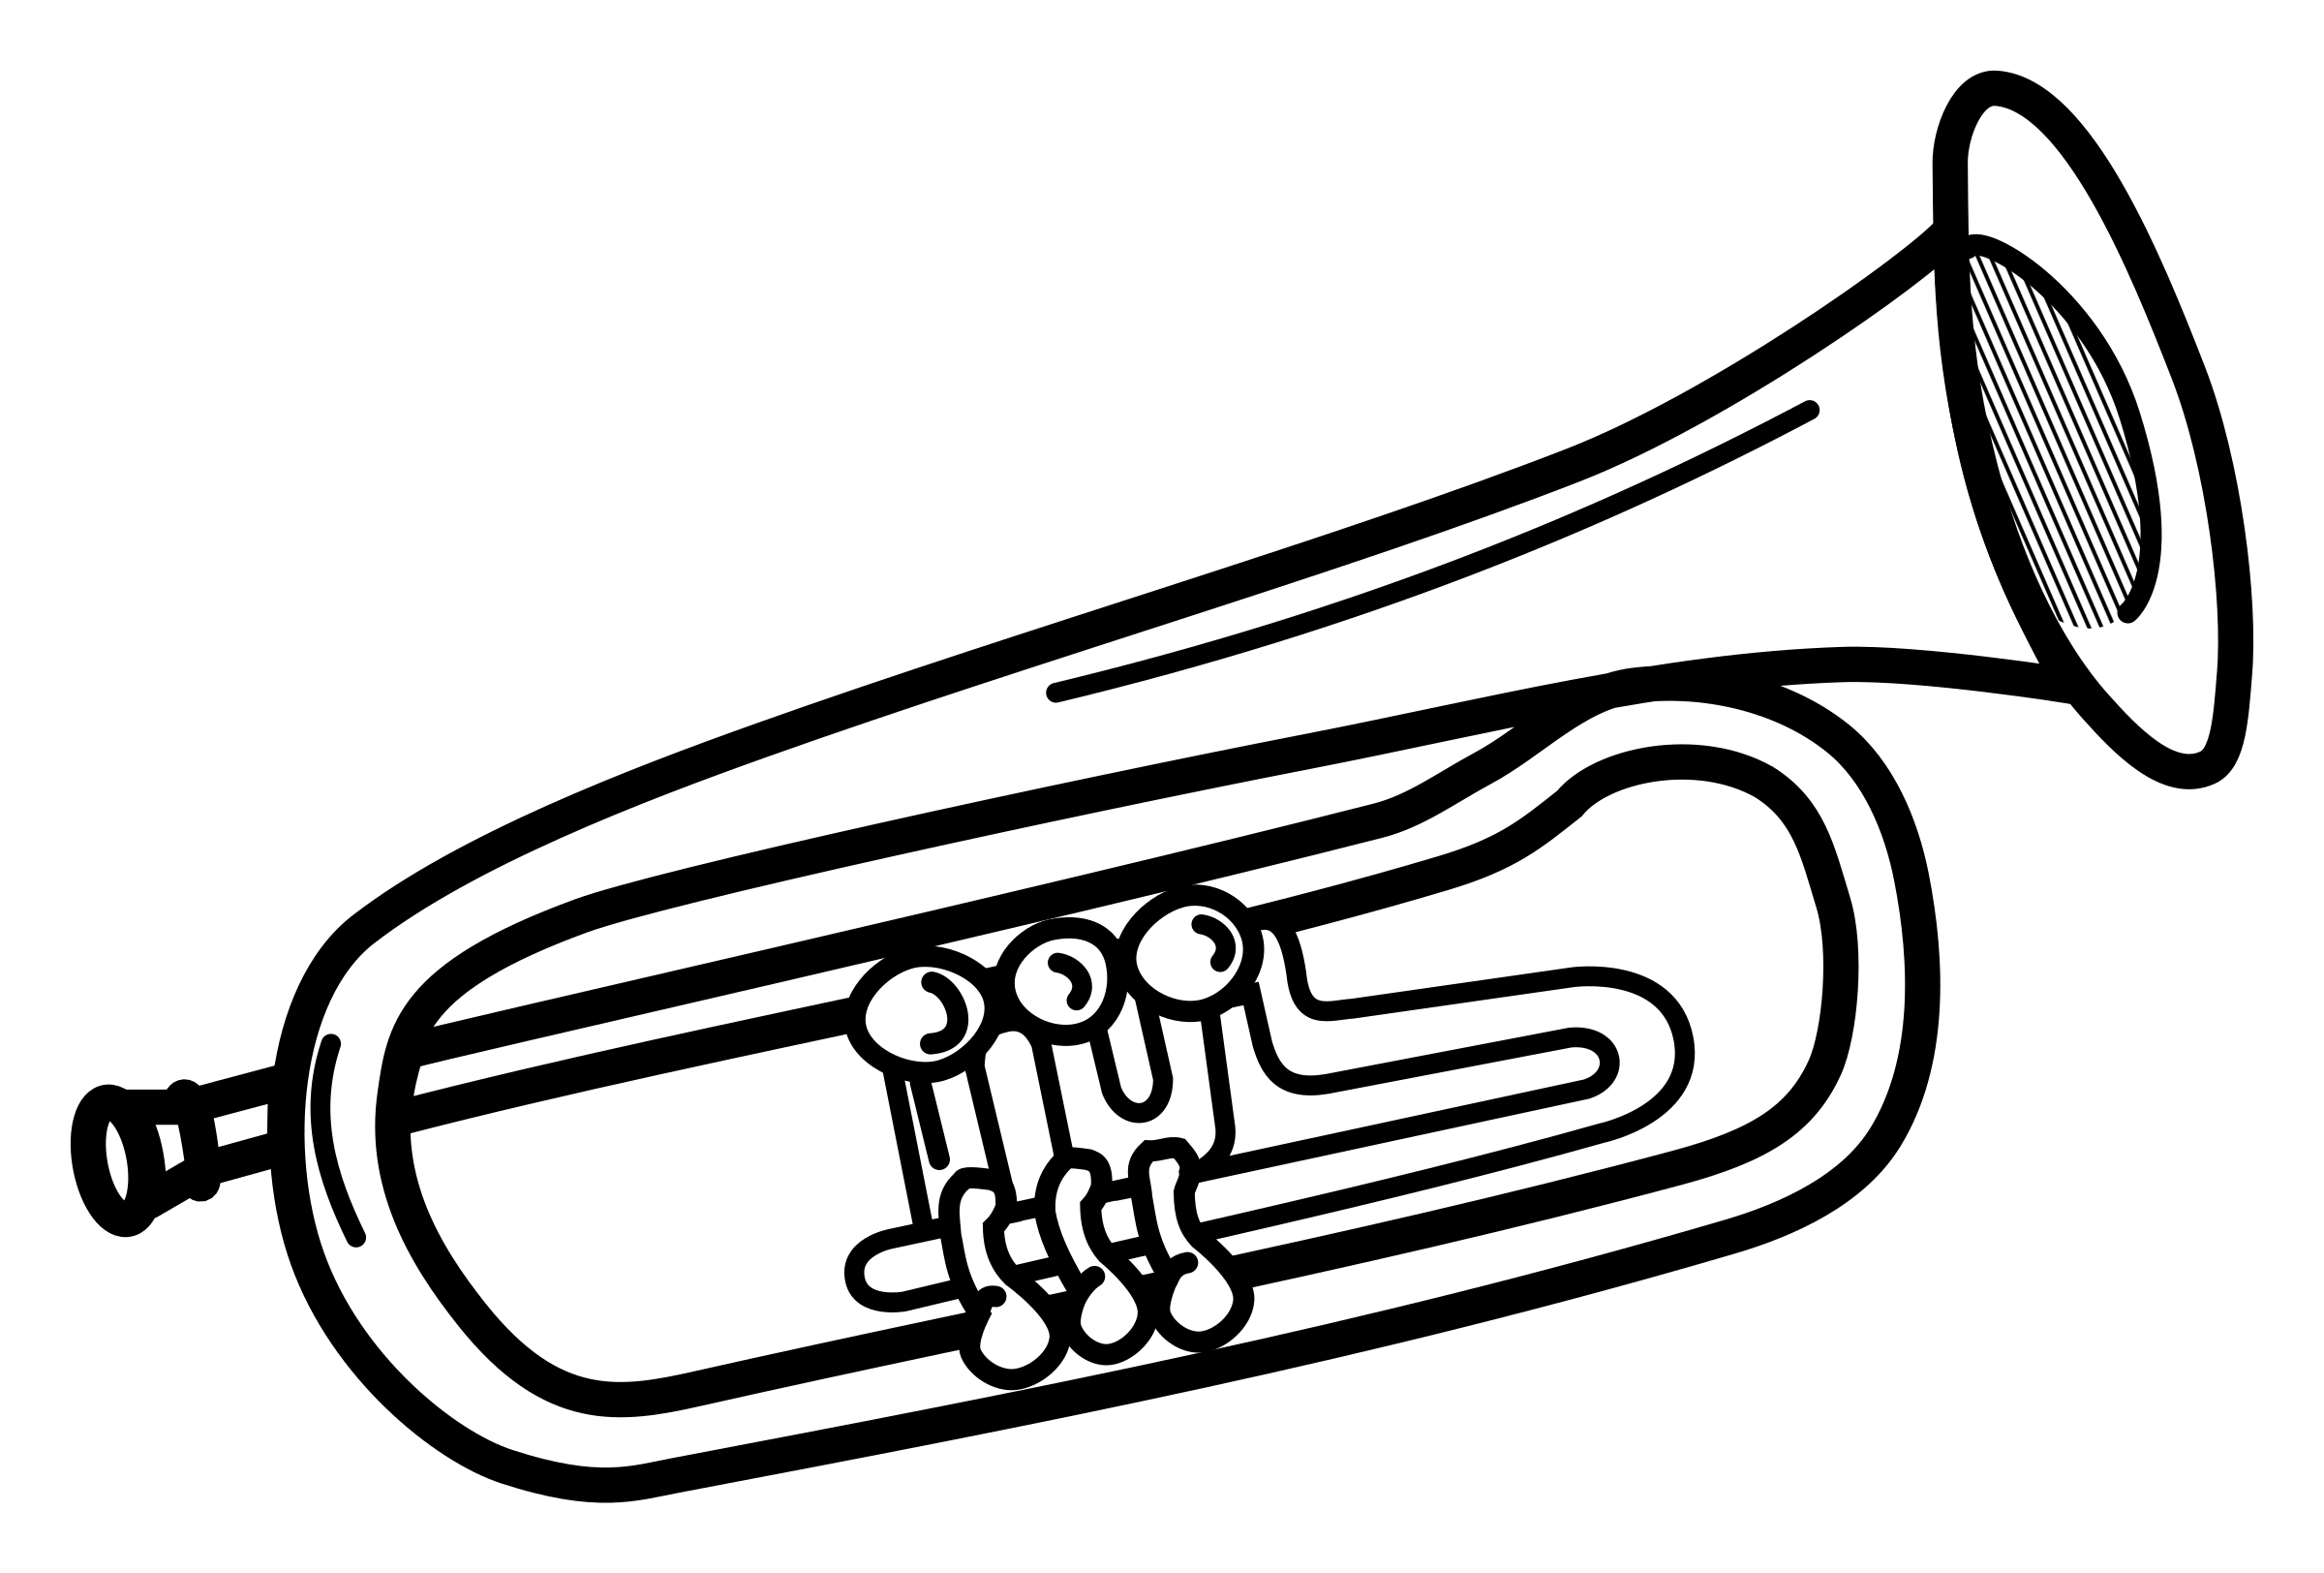 Trumpet clip art free clipart images 6.